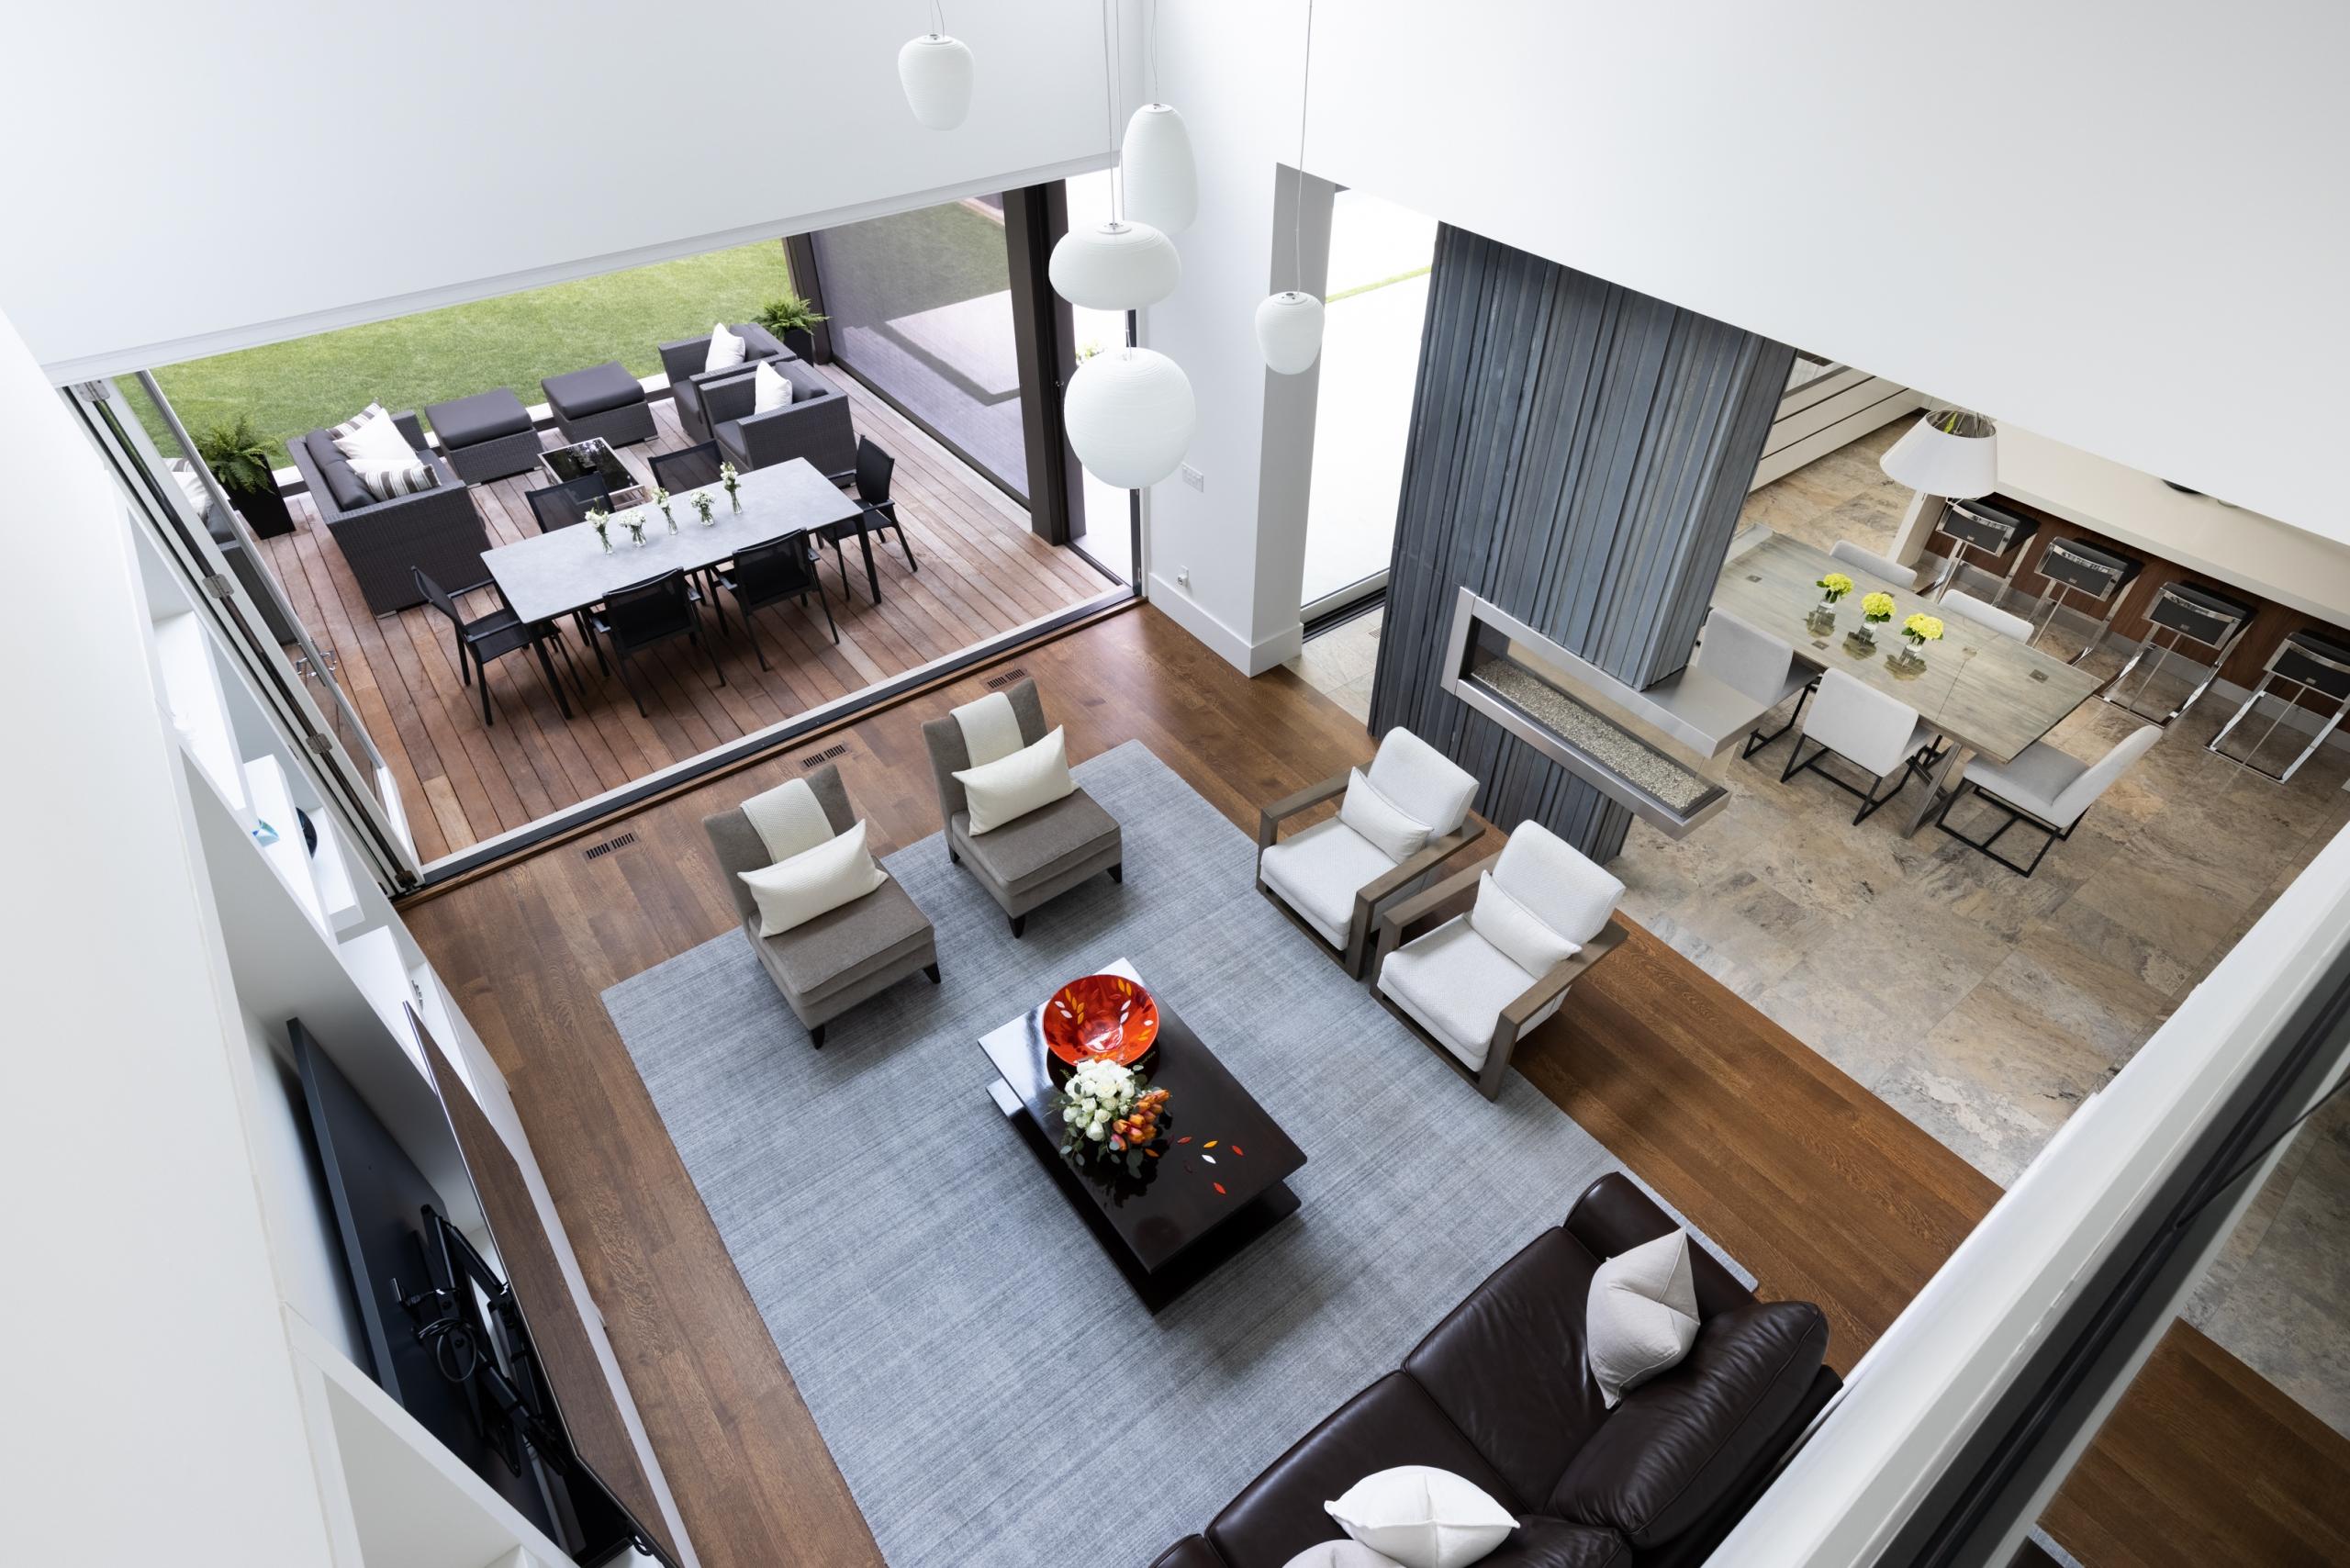 Living room featured at 65 Cox Drive, Oakville at Alex Irish & Associates